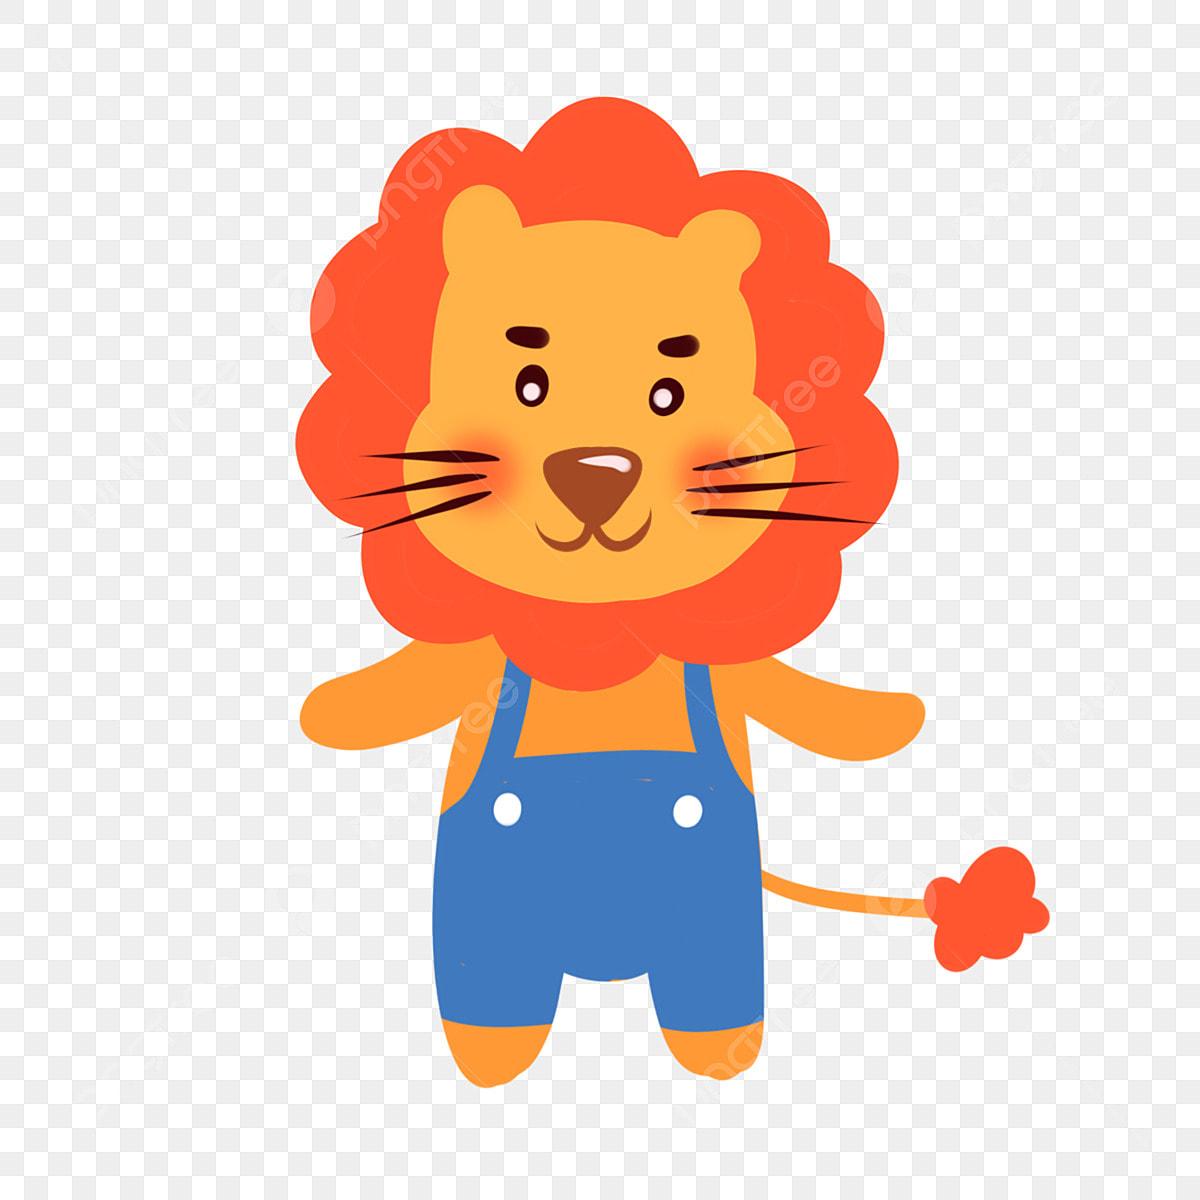 Lion Roaring Cartoon Clipart Vector - FriendlyStock